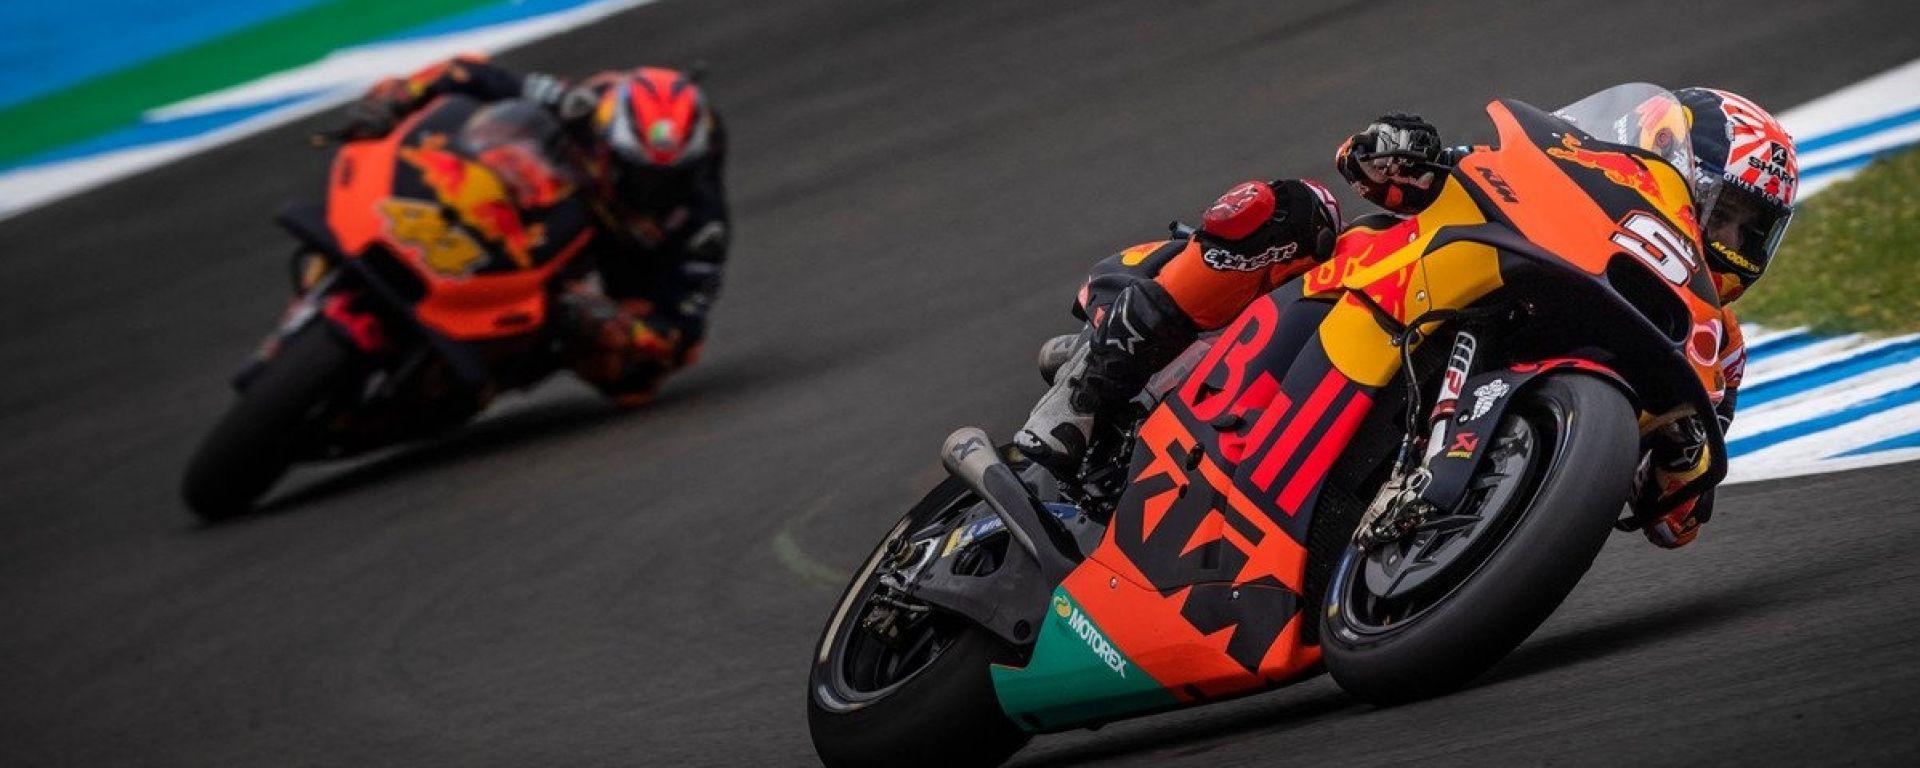 Red Bull KTM Factory Racing - Johann Zarco e Pol Espargaro